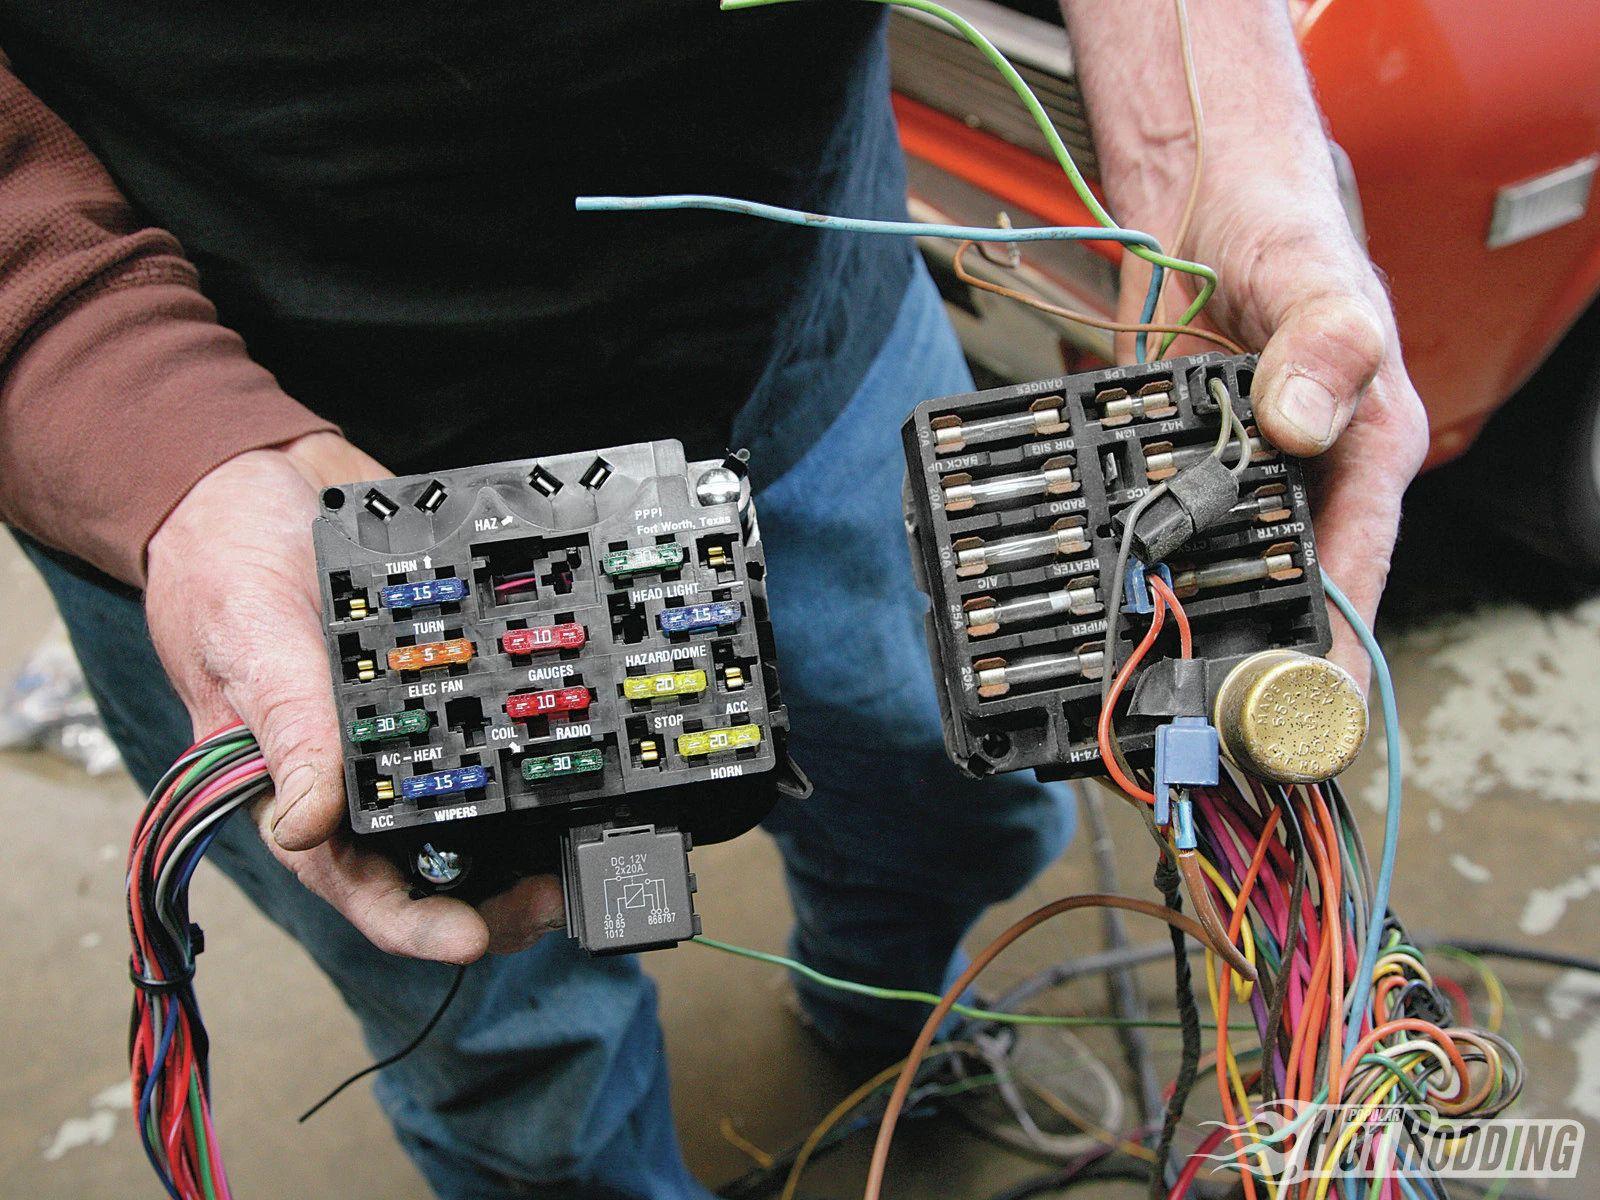 Chevy Nova Wiring Harness Library Domelightwiringjpg